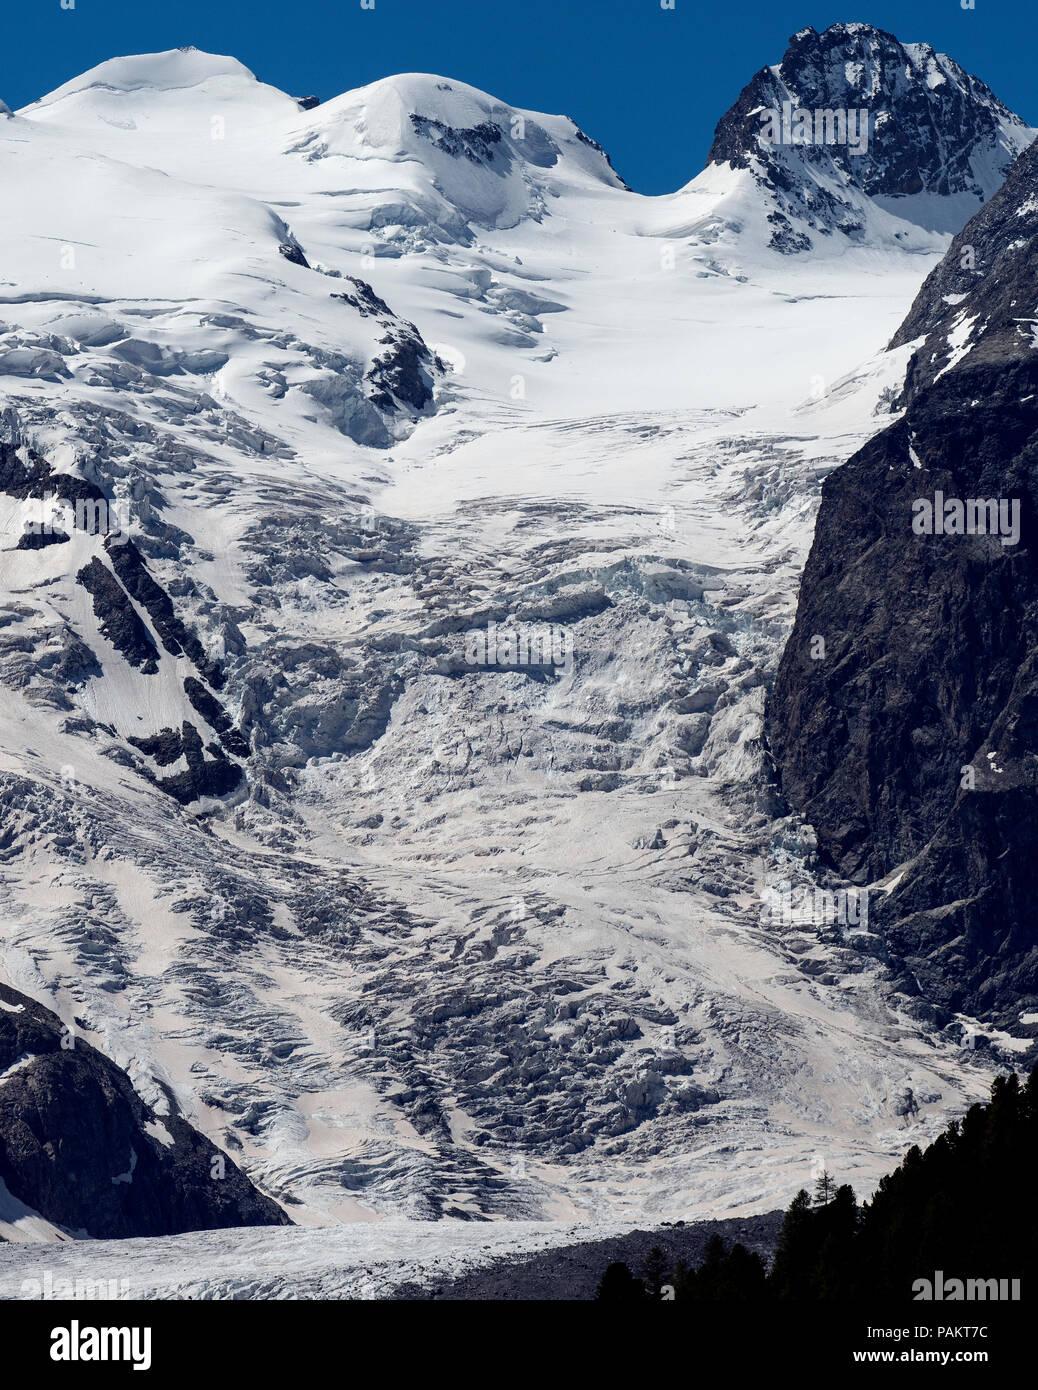 The Morteratschgletscher is a Alps - Glacier in the Bernina range in the canton of Grisons in Switzerland near the Diavolezza ski route. Piz Zupo top  - Stock Image